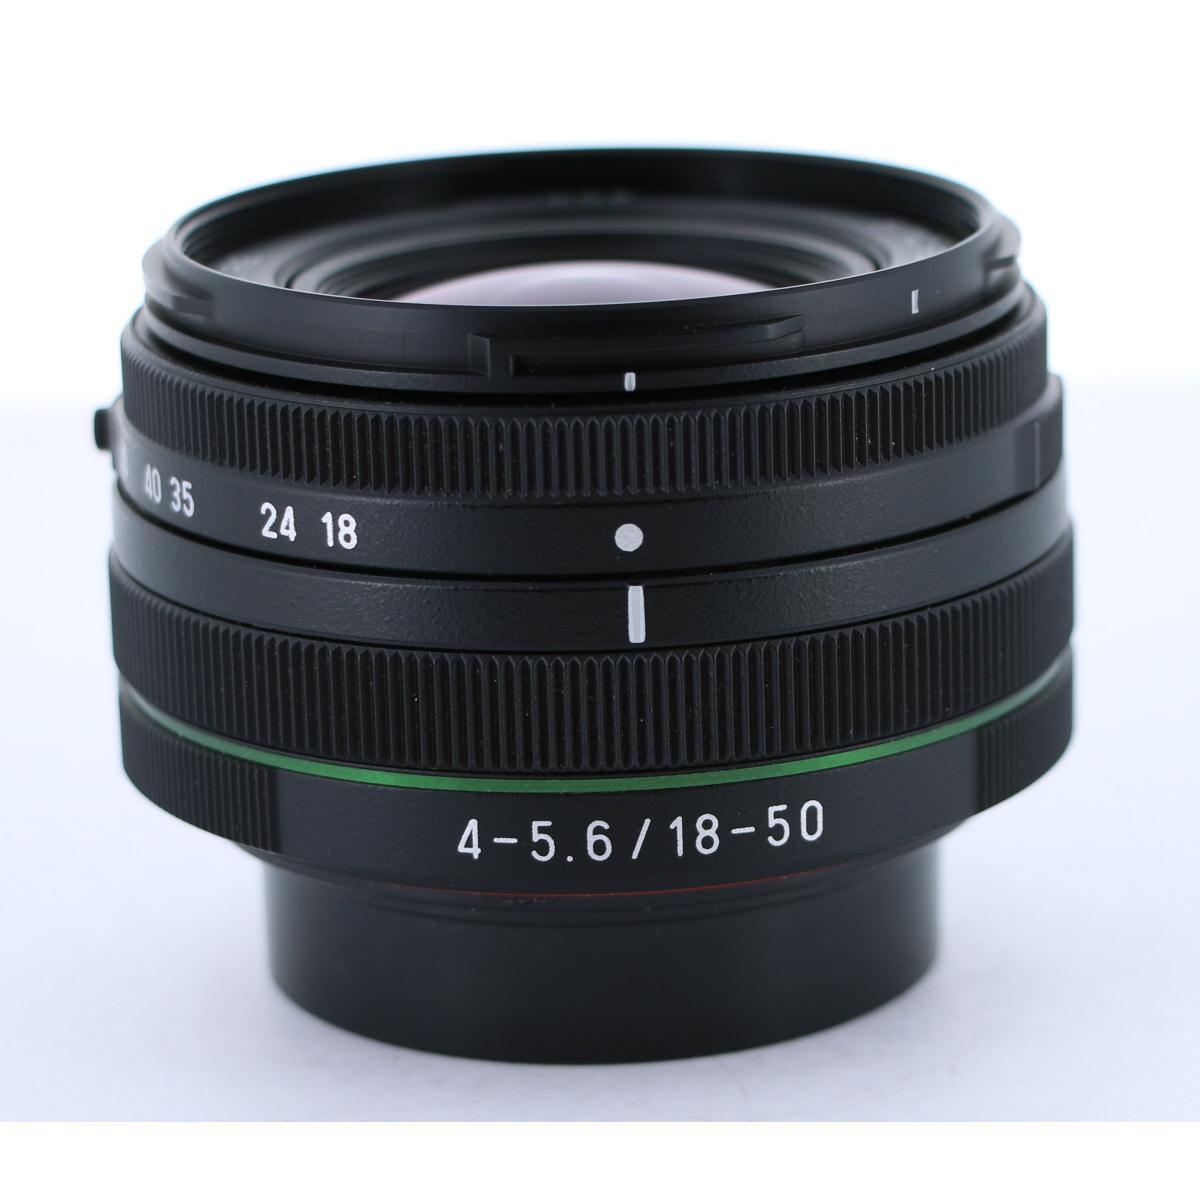 PENTAX DAL18-50mm F4-5.6DC WR RE【中古】